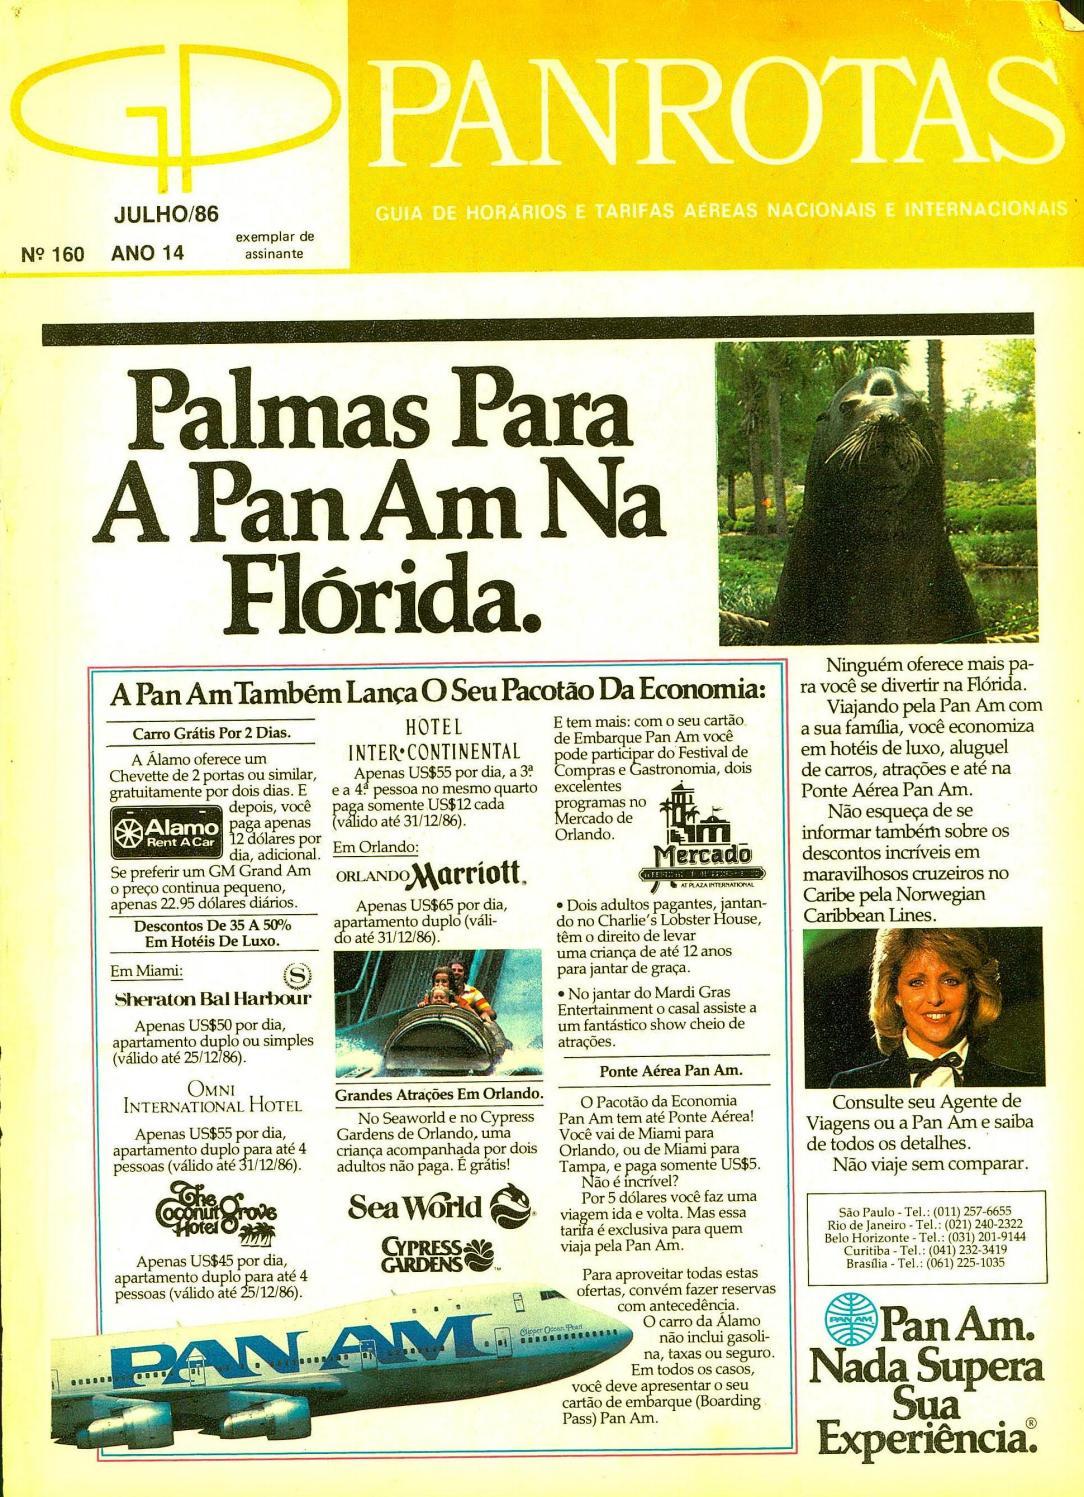 b6ca5f120 Guia PANROTAS - Edição 160 - Julho/1986 by PANROTAS Editora - issuu